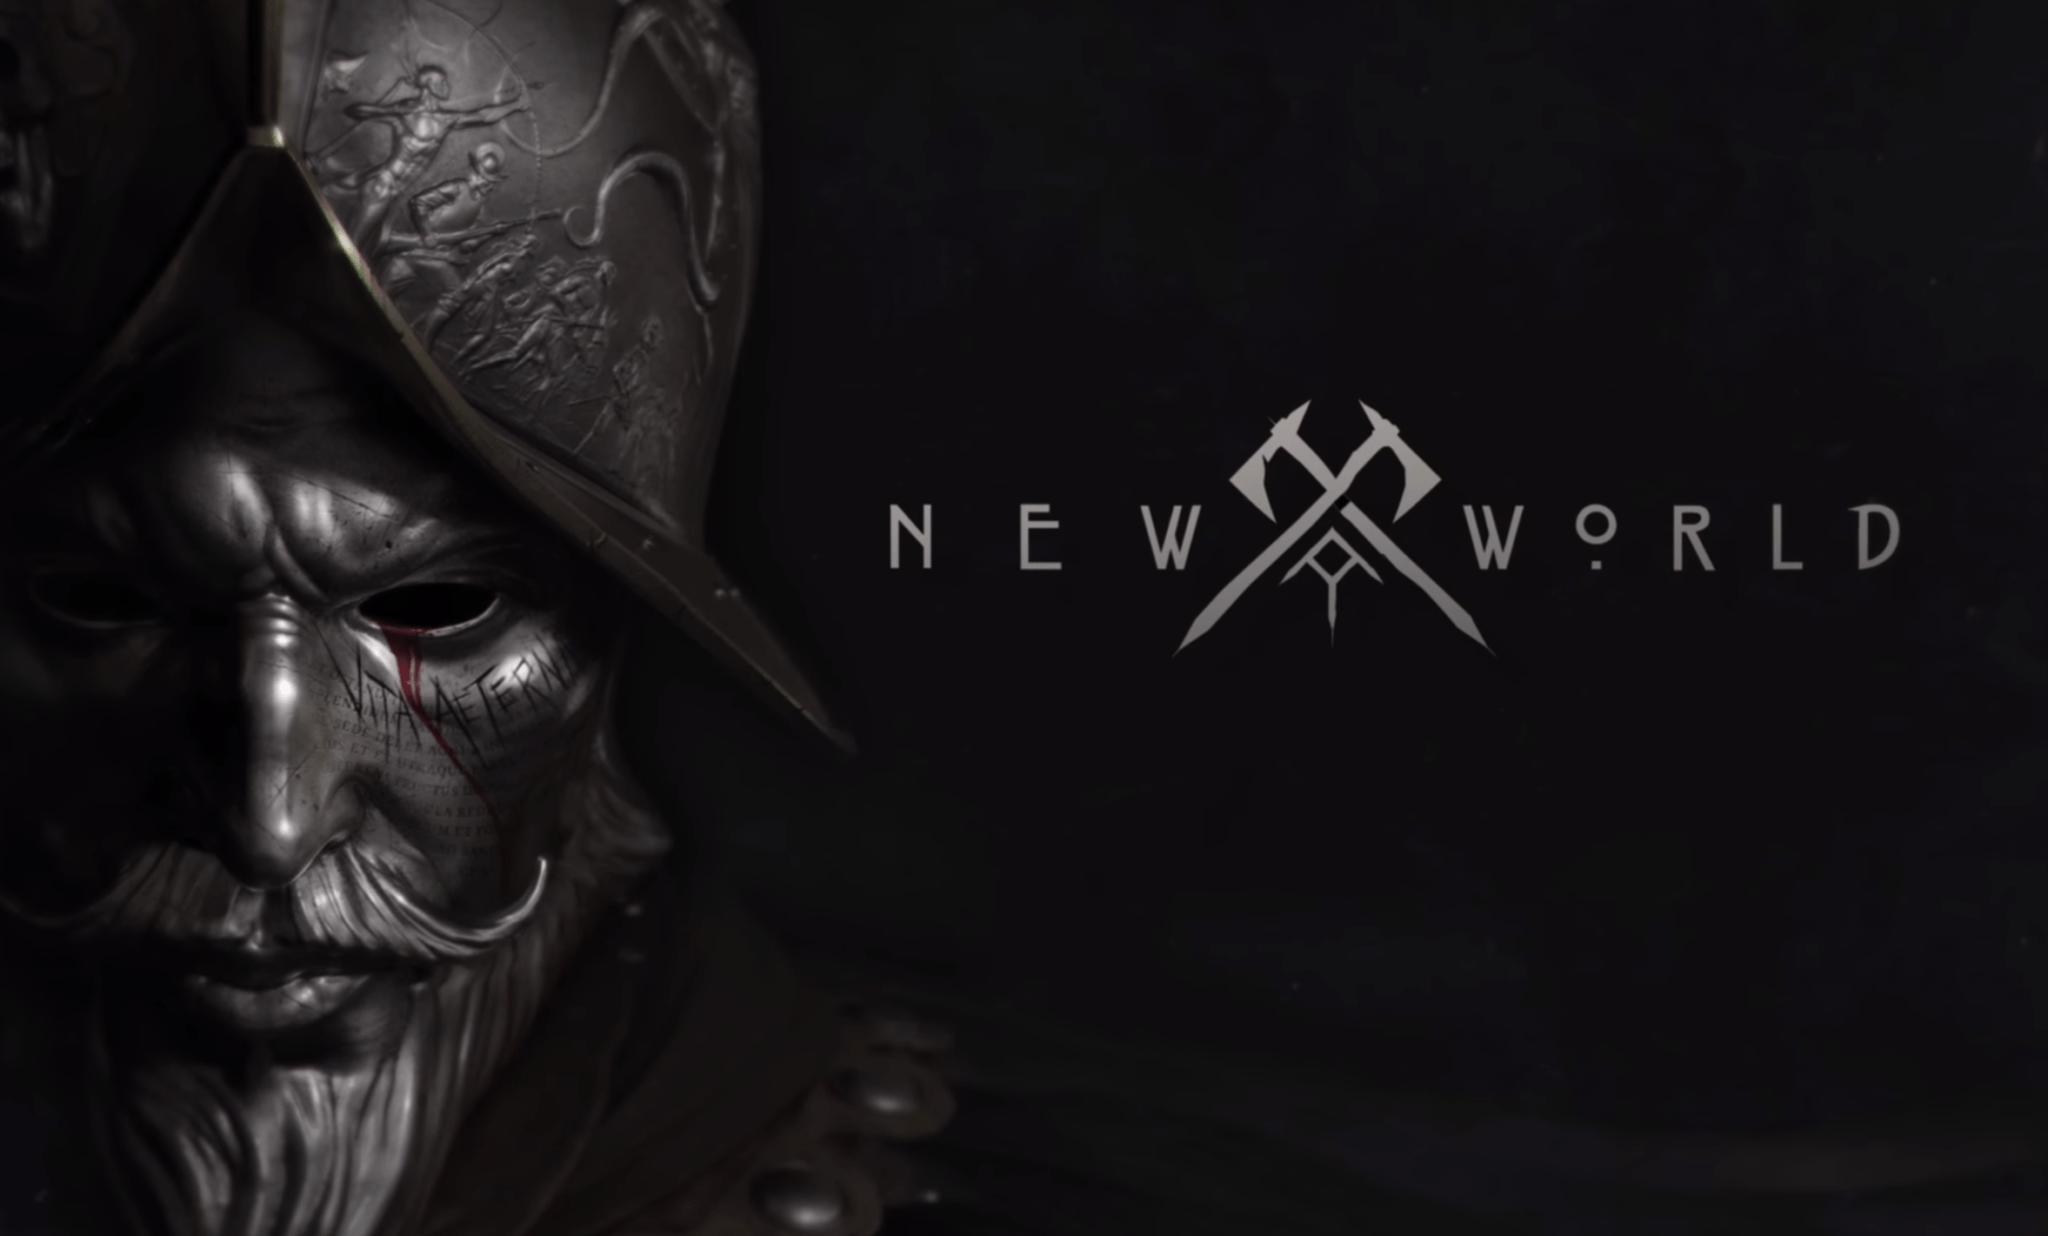 New-World-Title